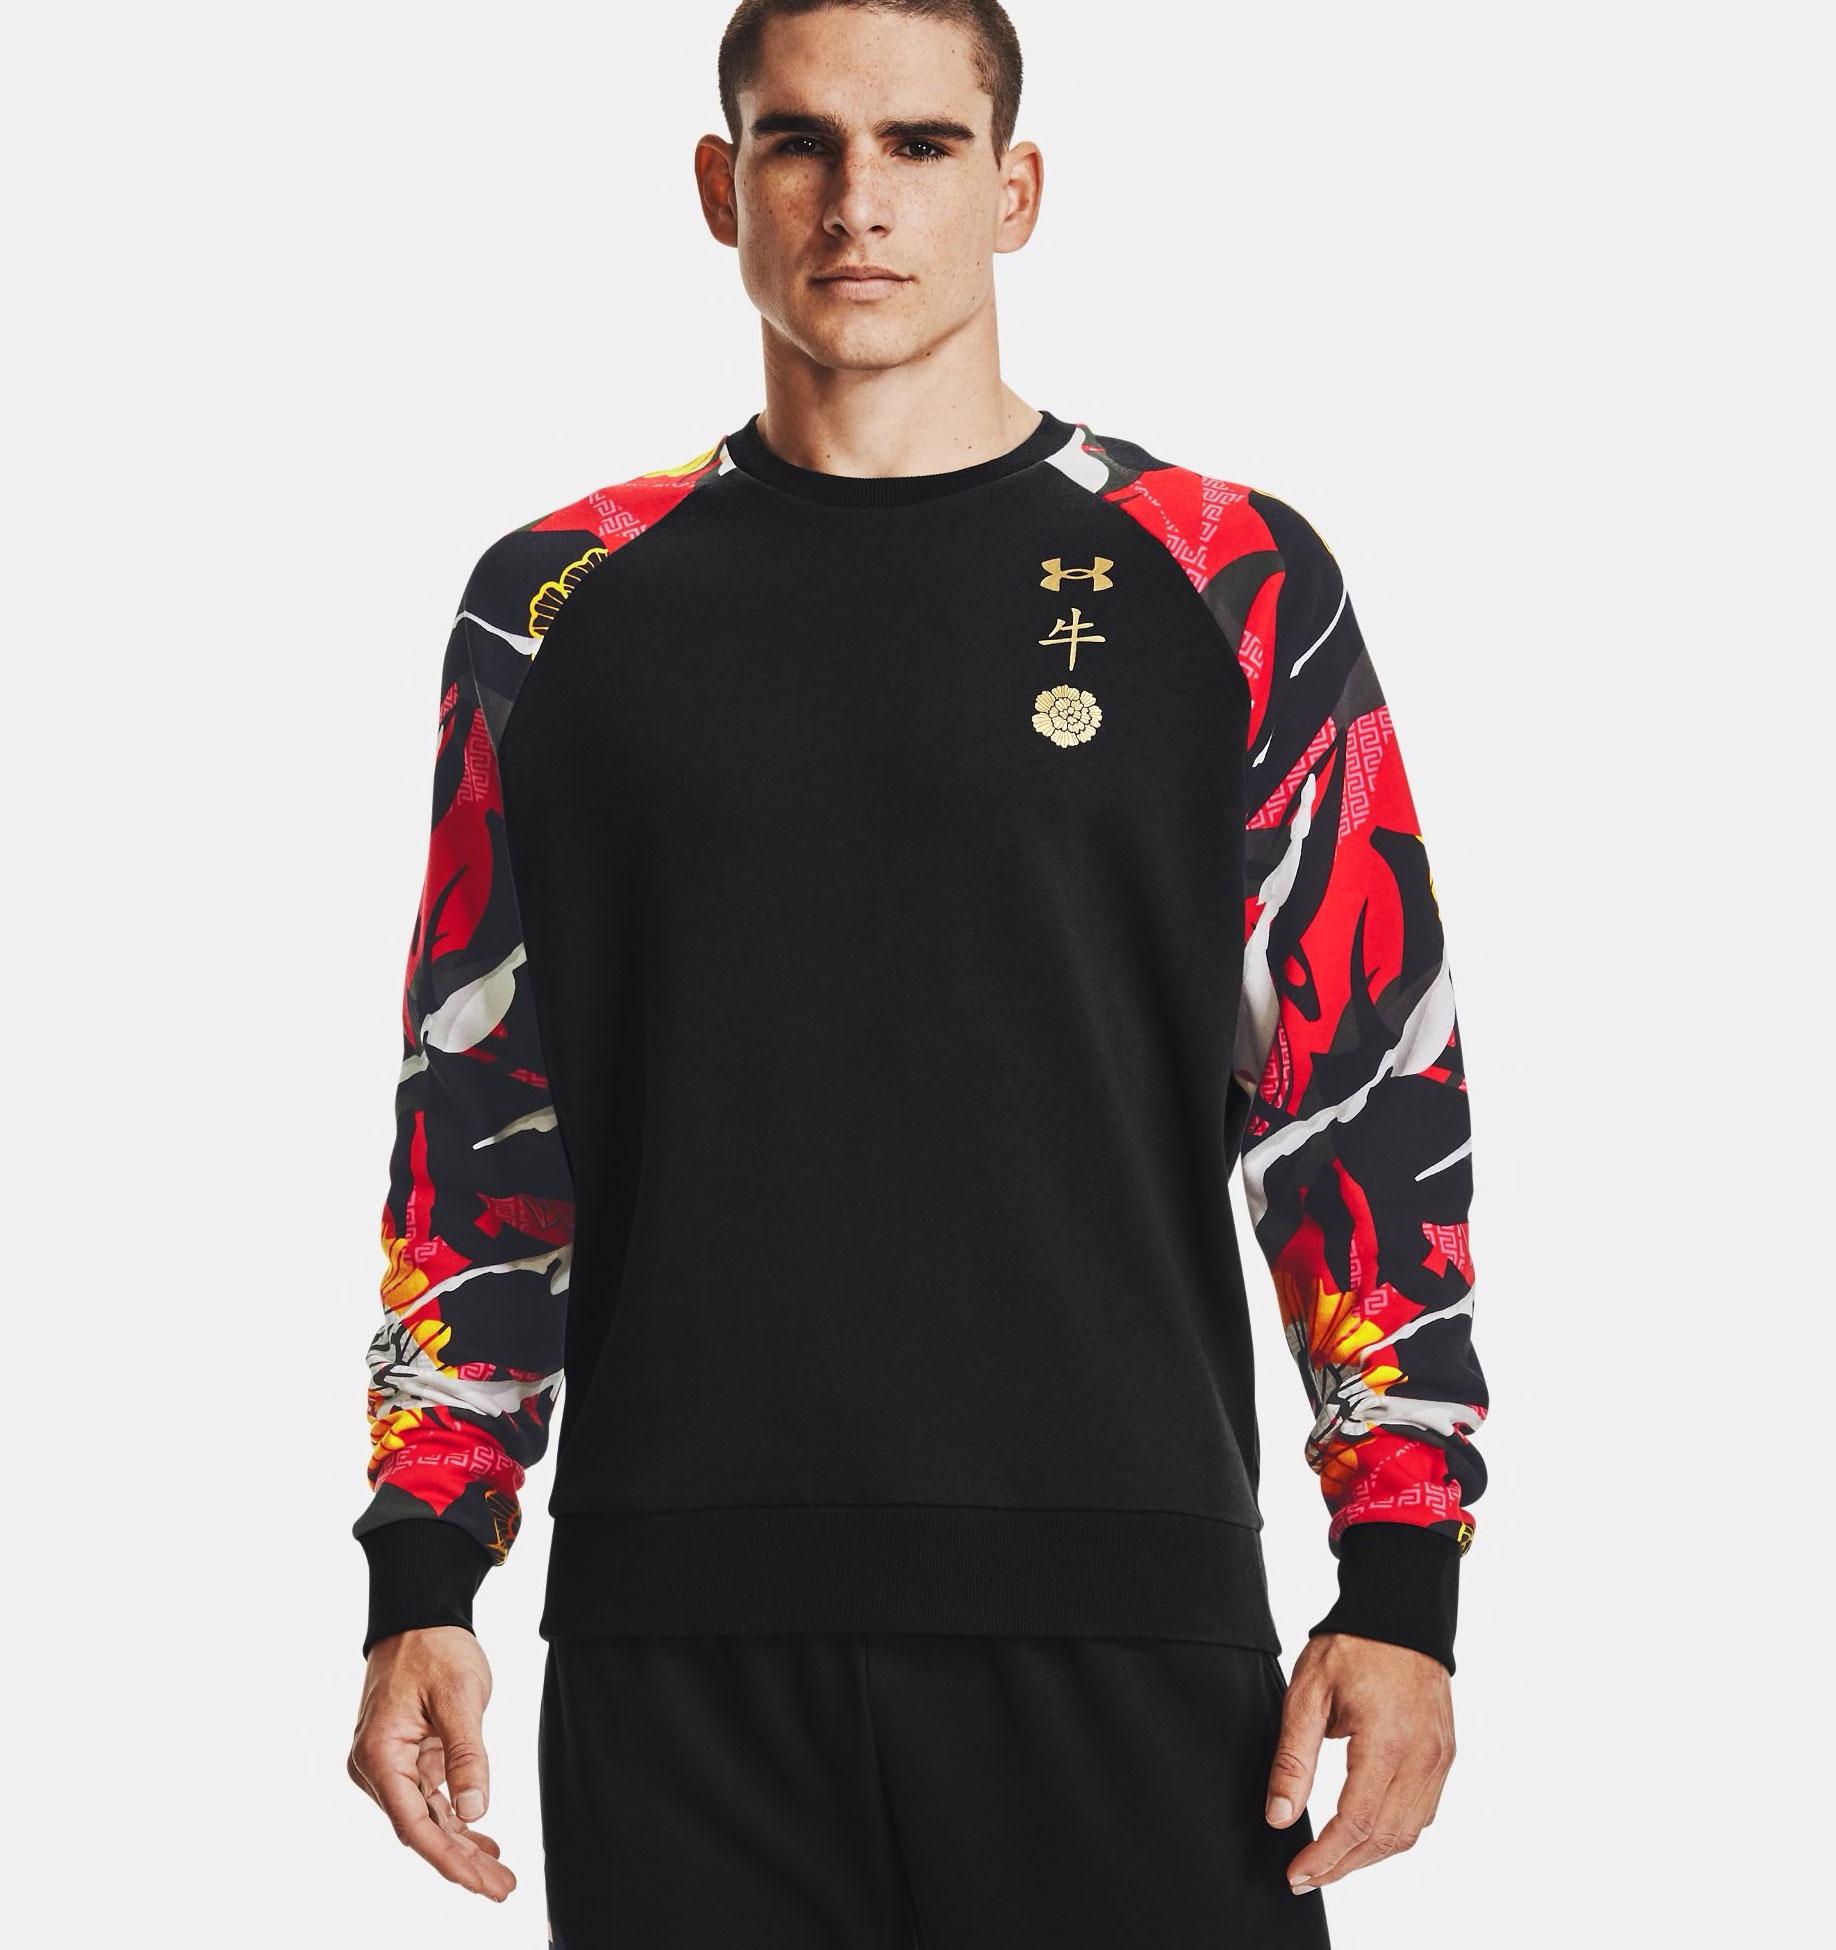 under-armour-chinese-new-year-cny-sweatshirt